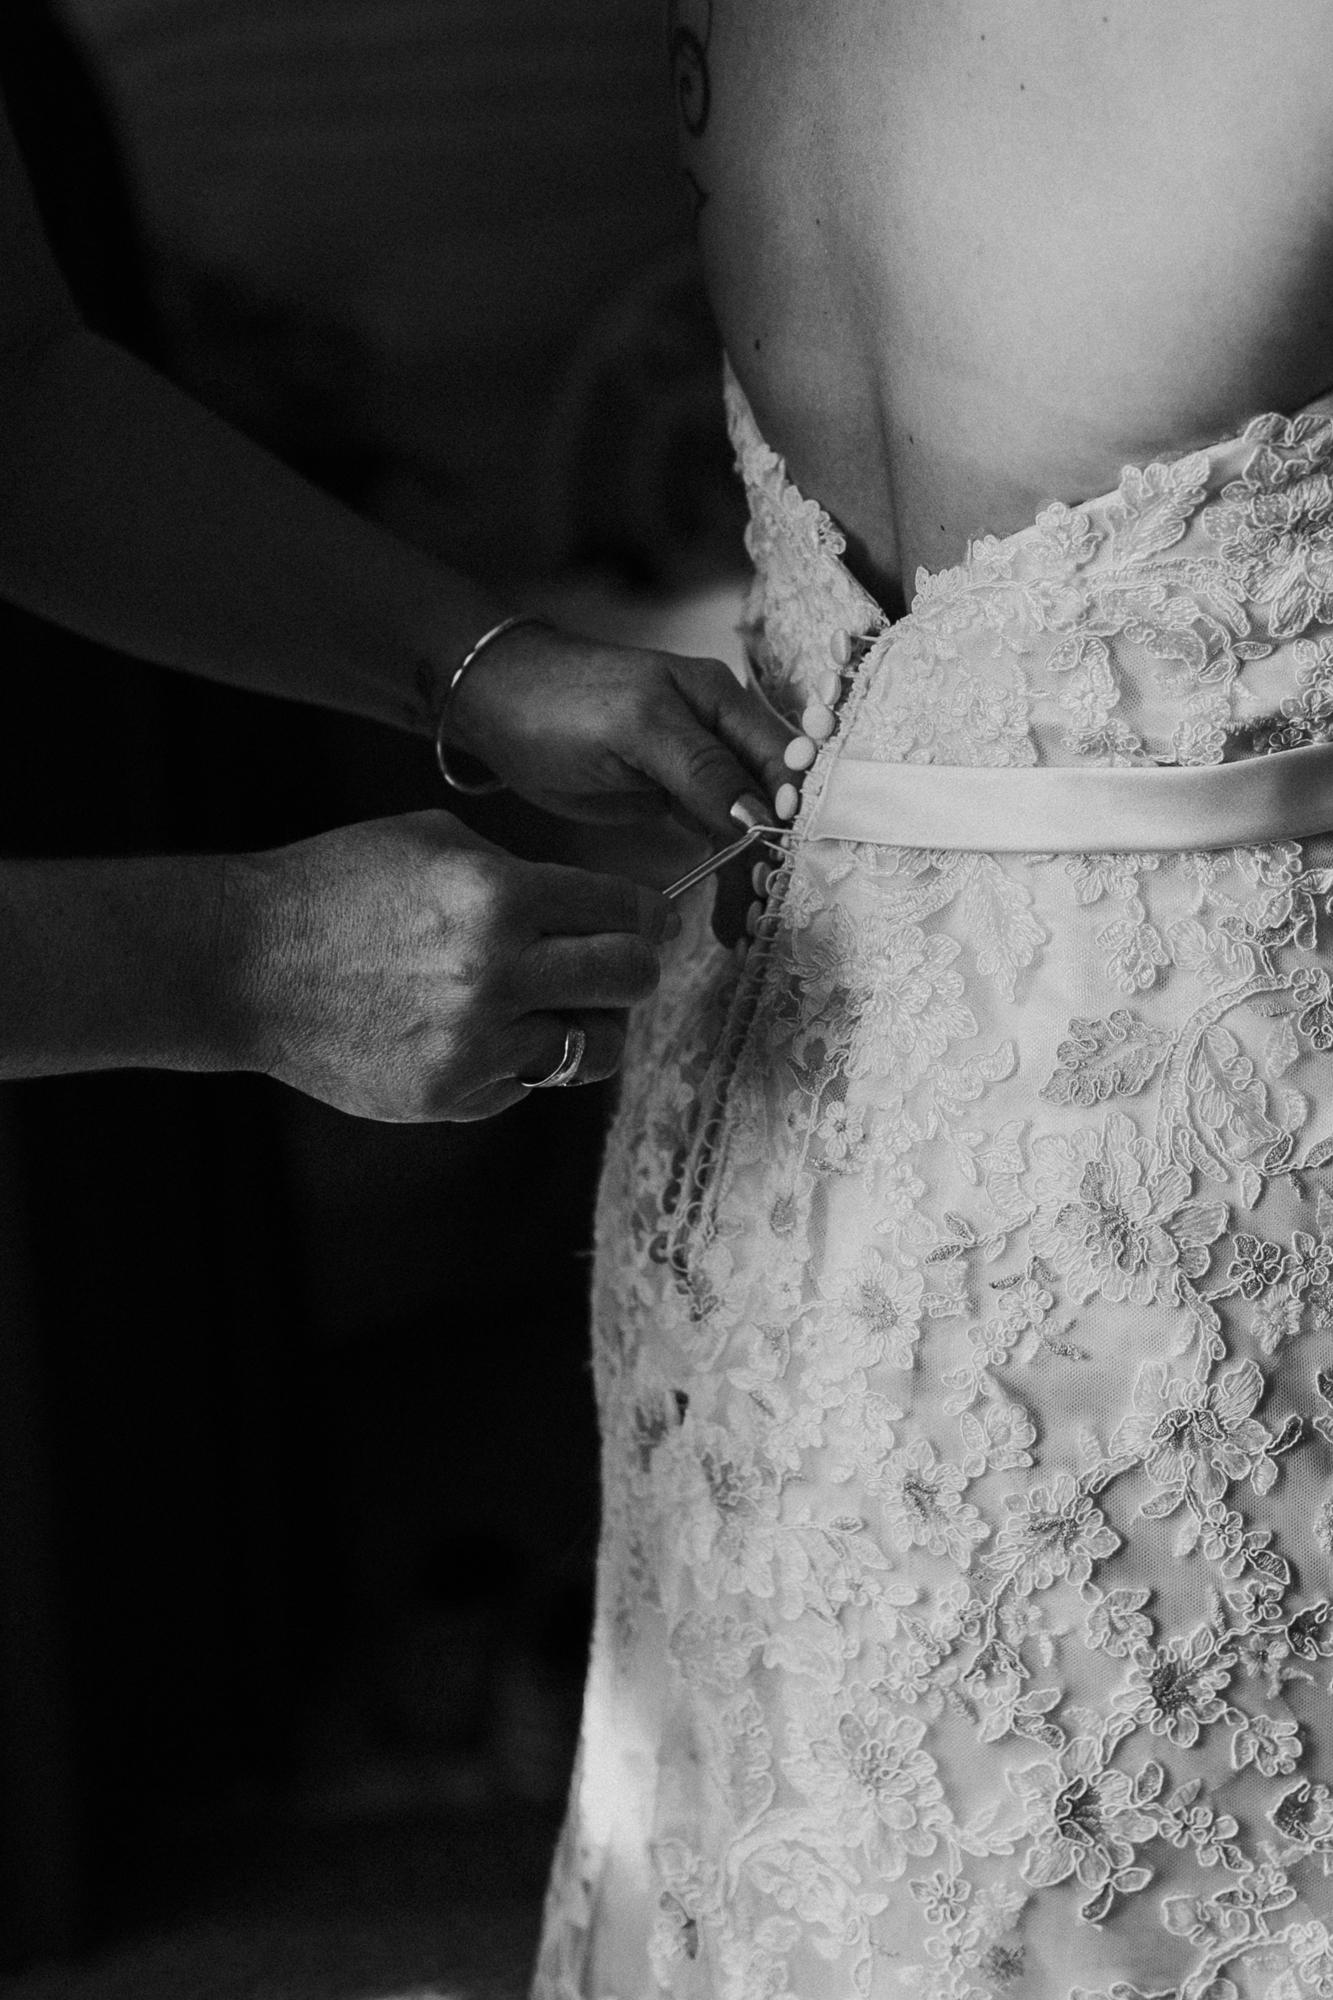 mom-ties-wedding-dress-black-and-white-photography